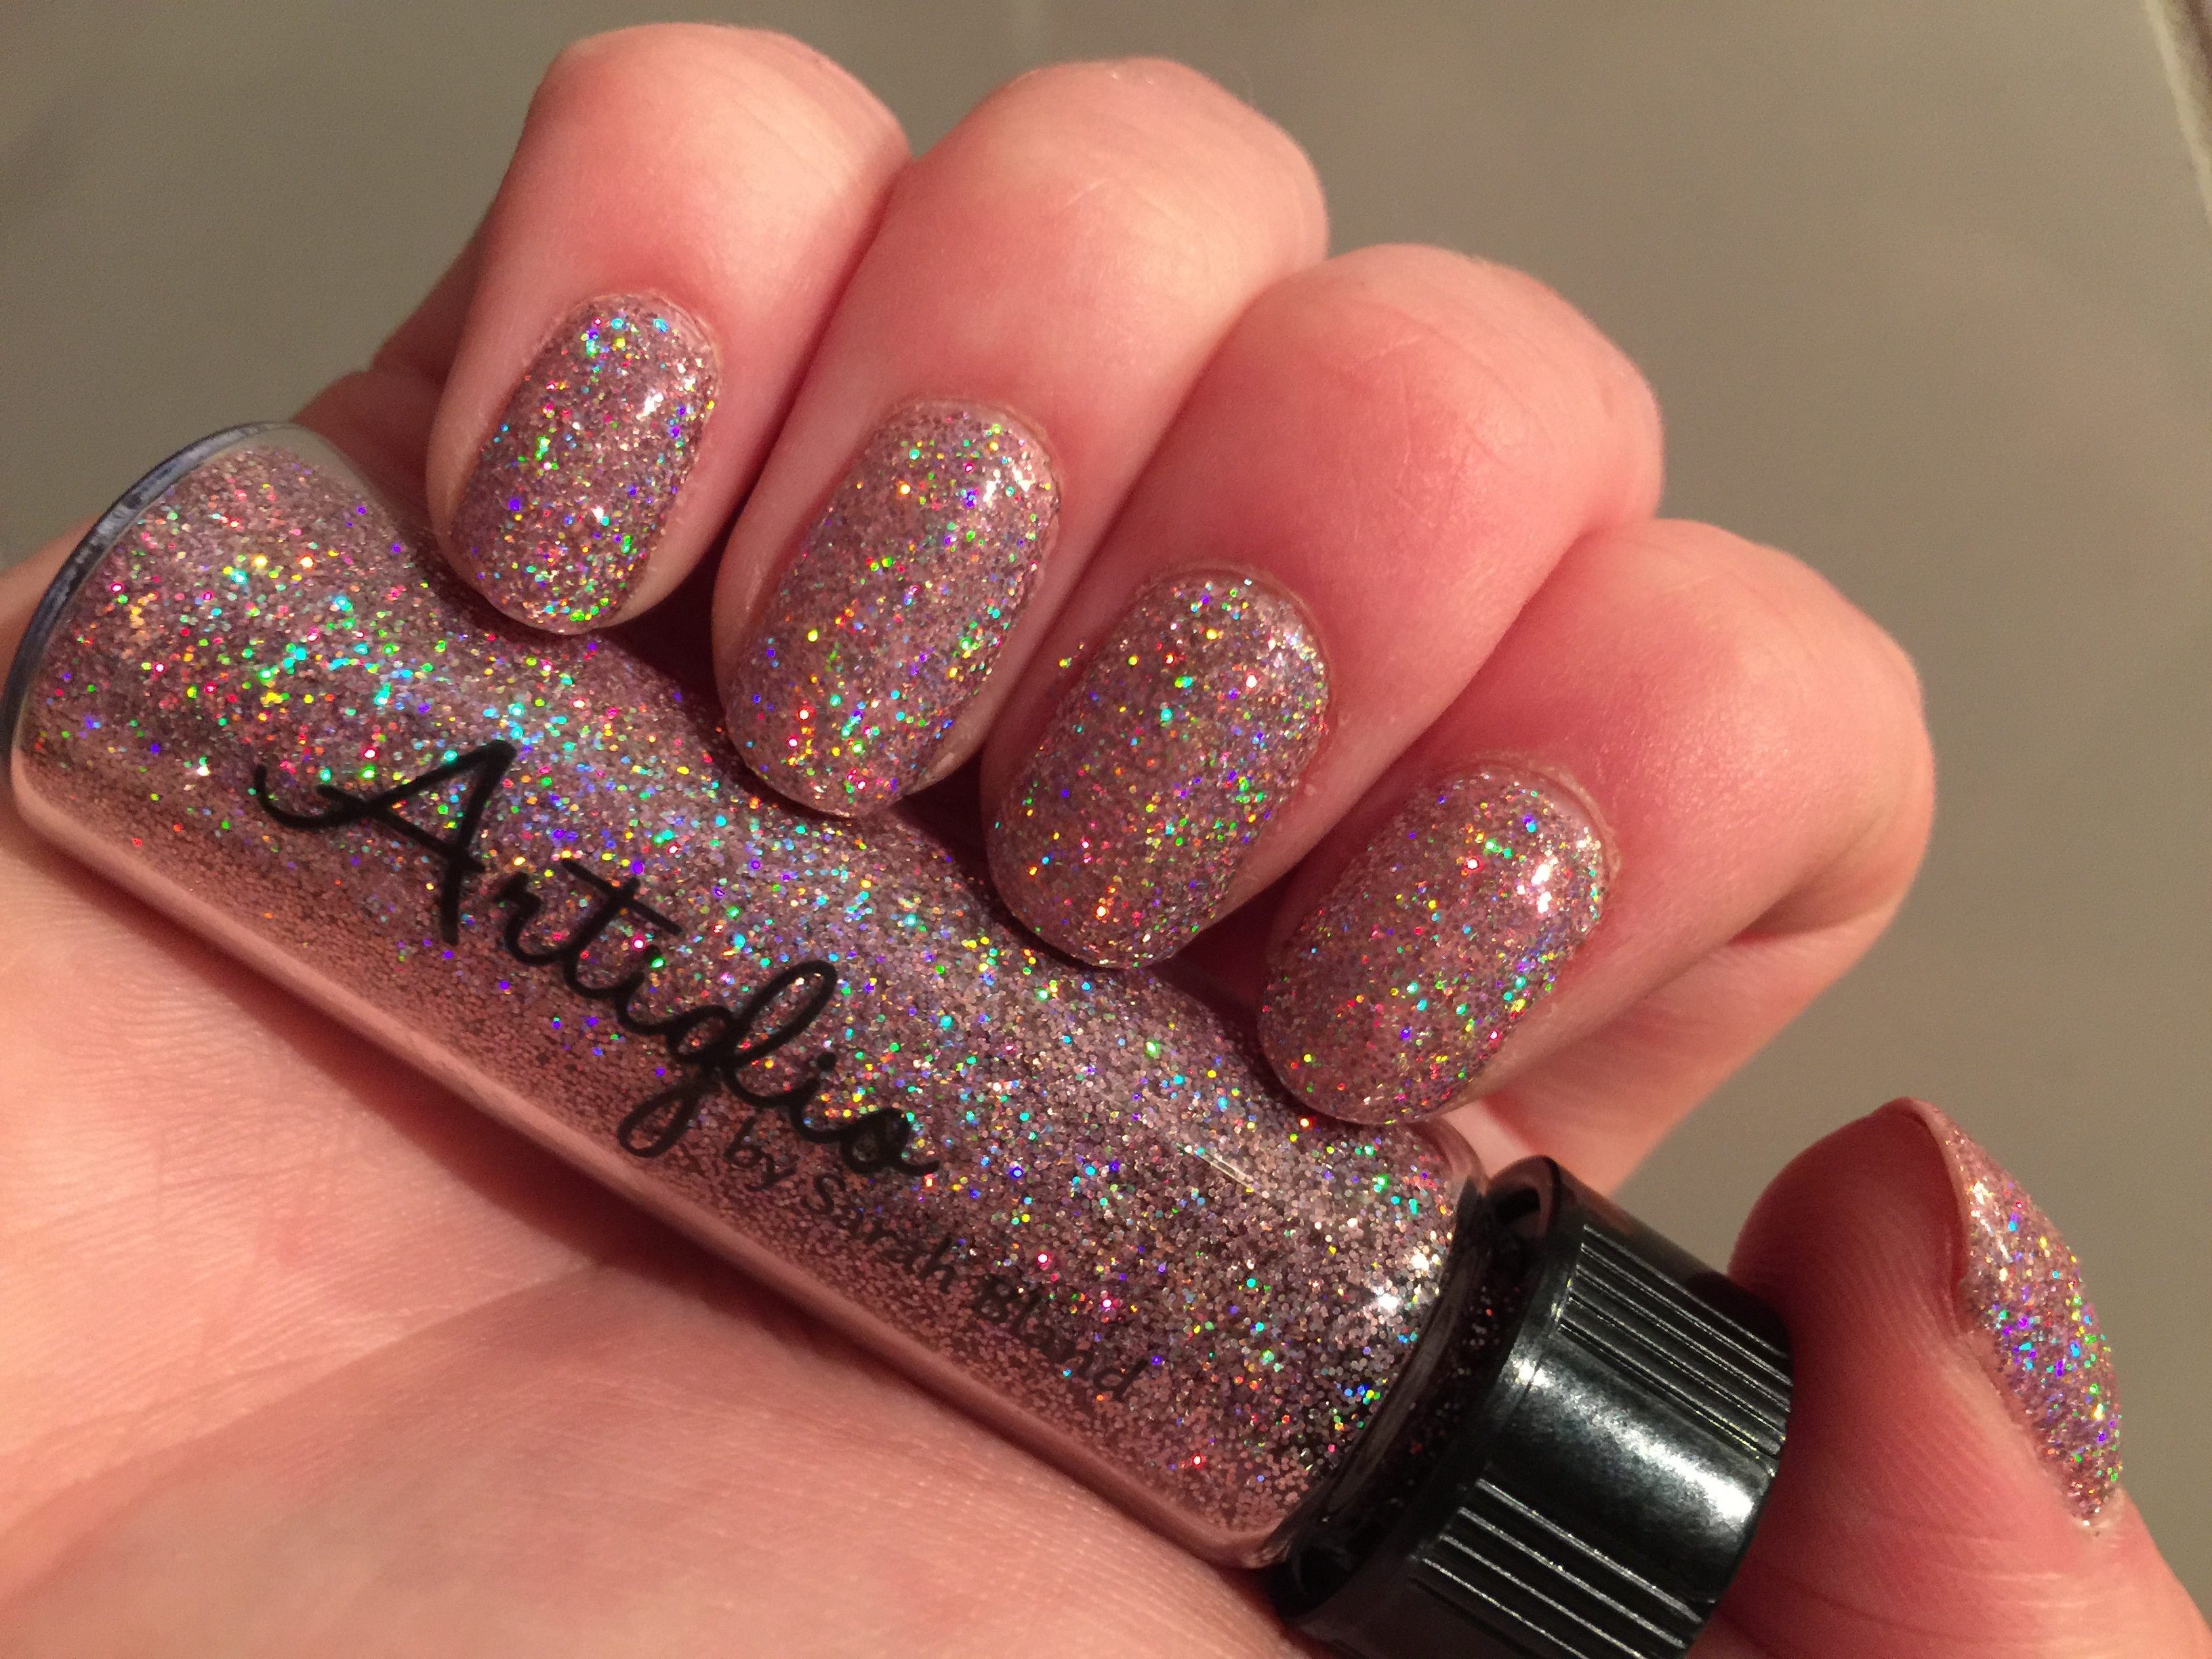 nails-glamournails-met-artiglio-lola